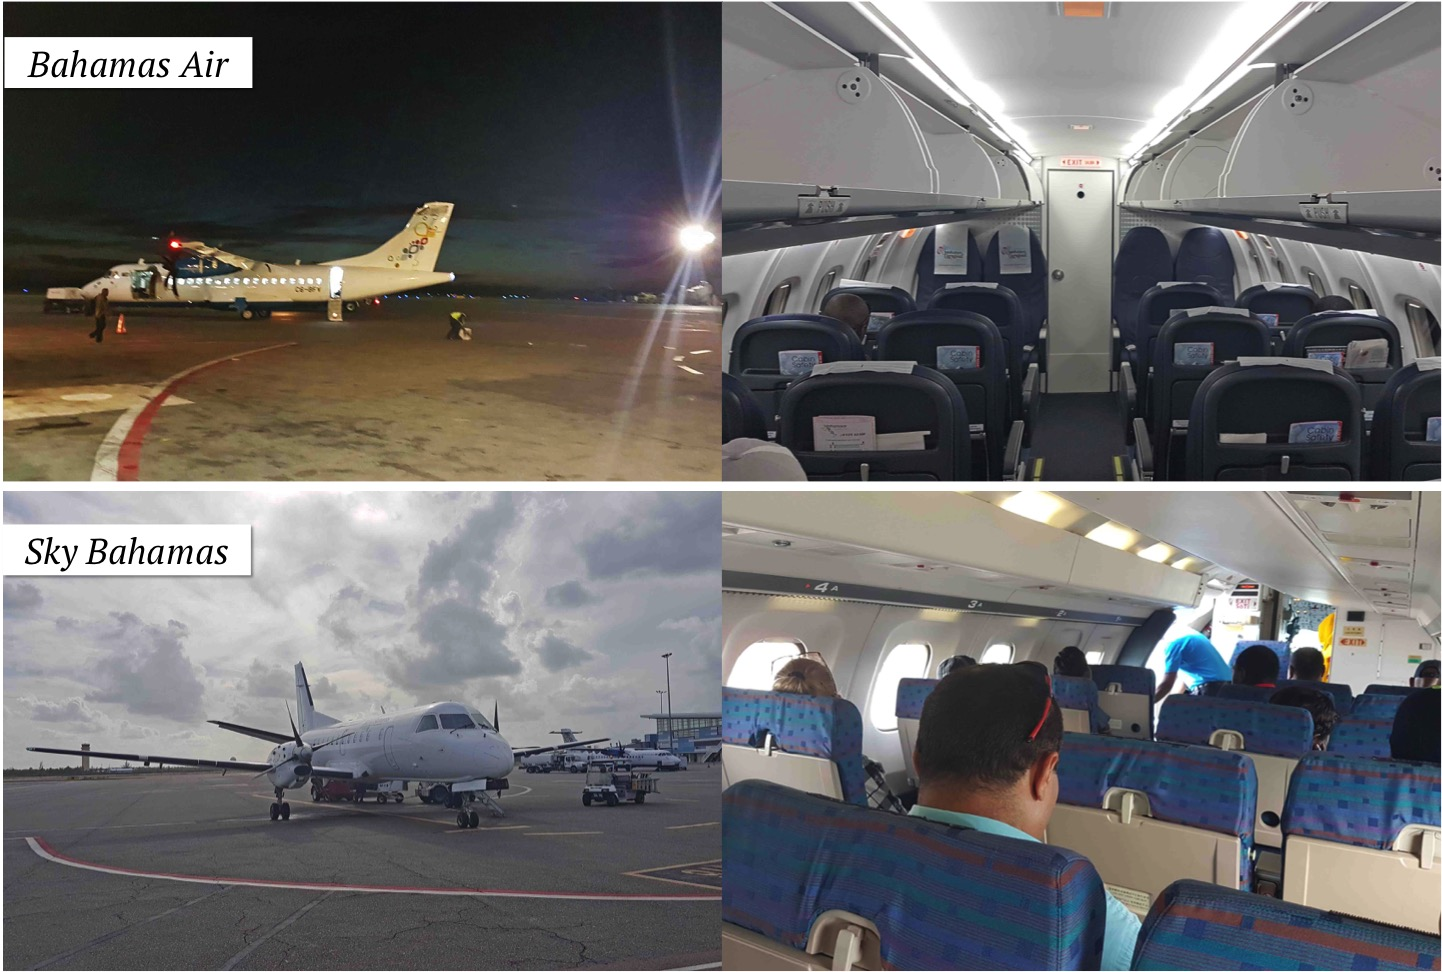 Aeronaves da Bahamas Air e da Sky Bahamas